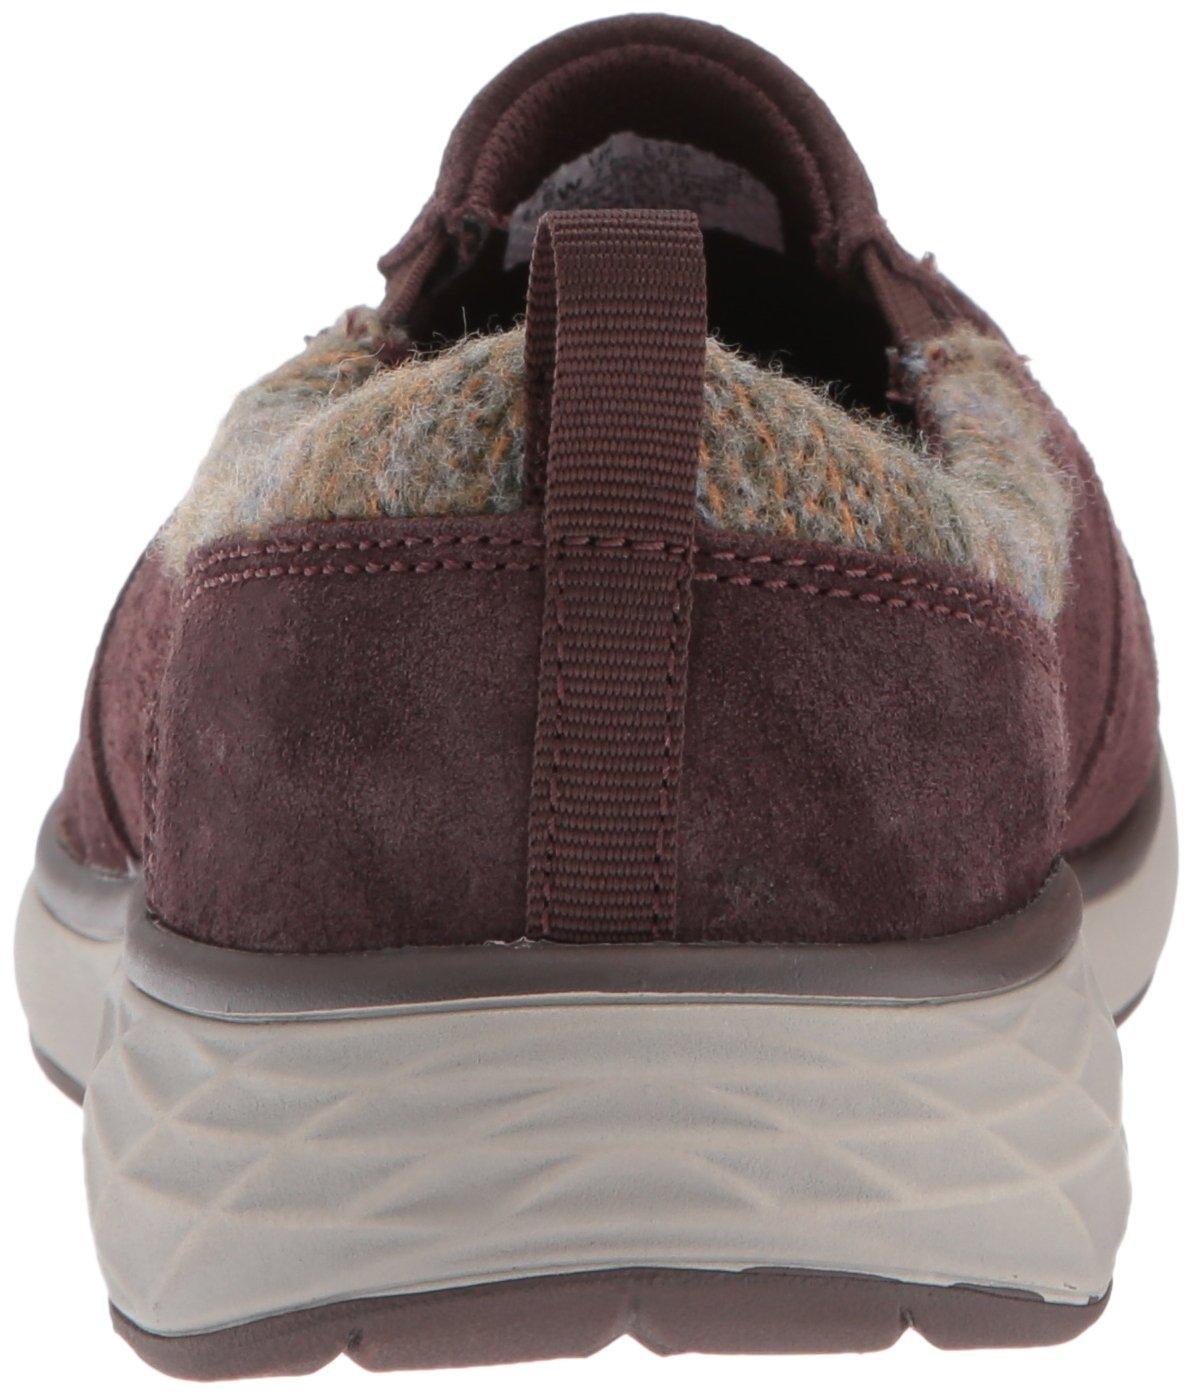 Ryka Women's B(M) Terrain Sneaker B01N3C86WH 5.5 B(M) Women's US|Chestnut/Pink aae429